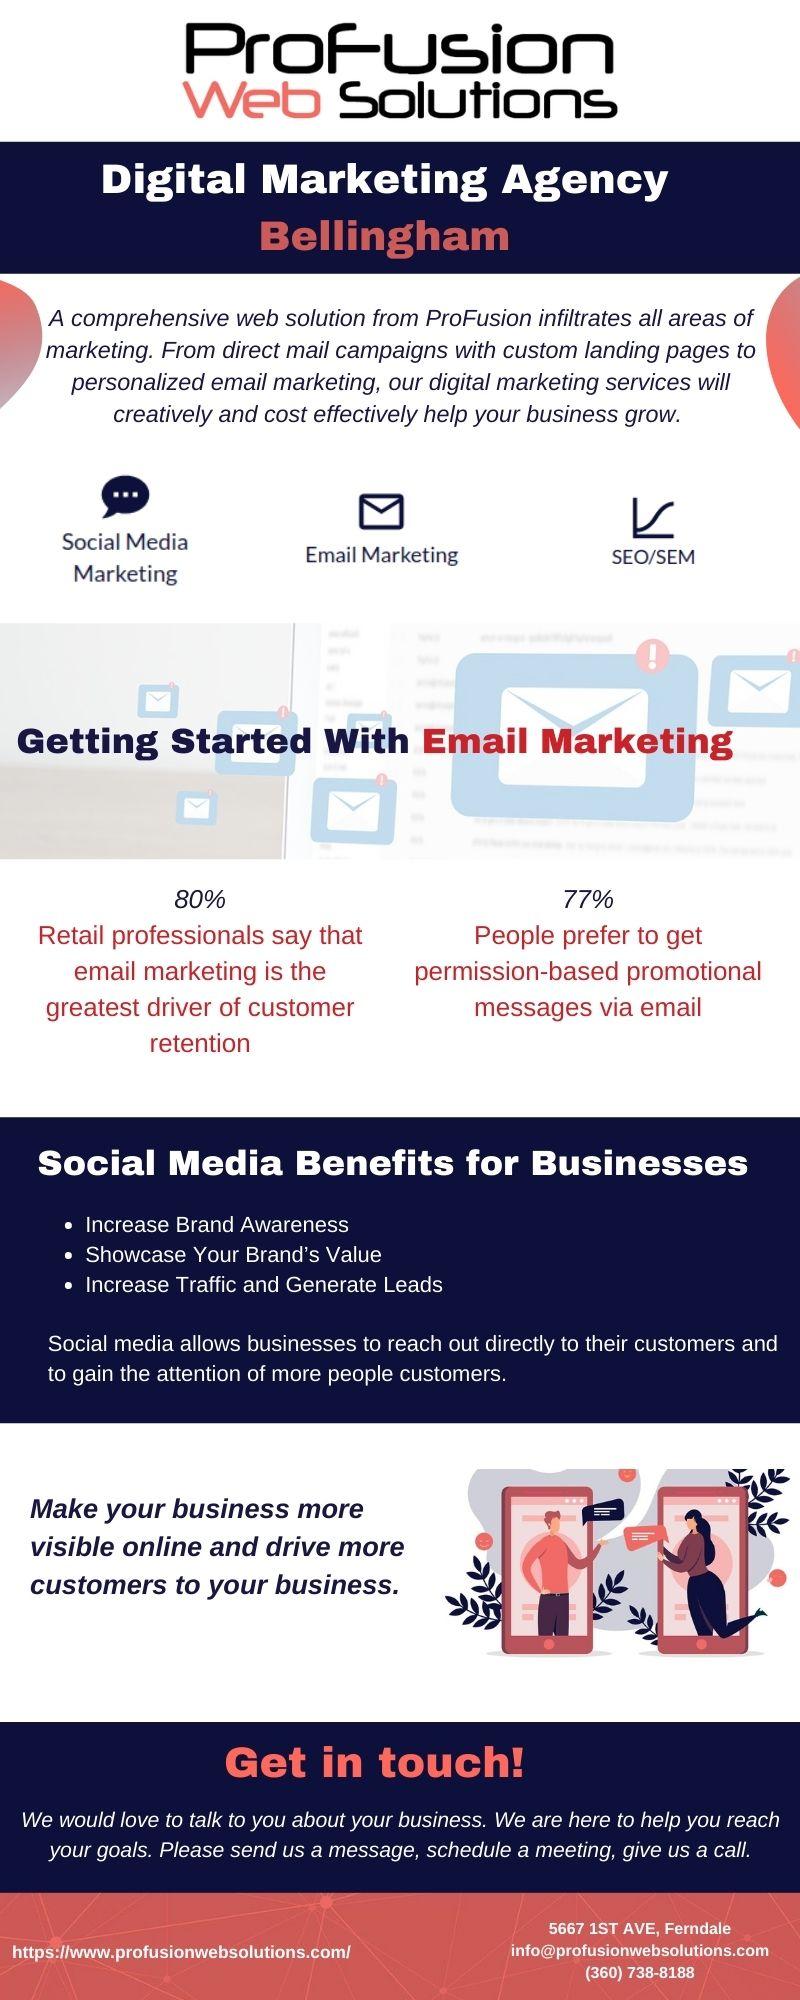 Digital Marketing Agency In Bellingham – ProFusion Web Solutions